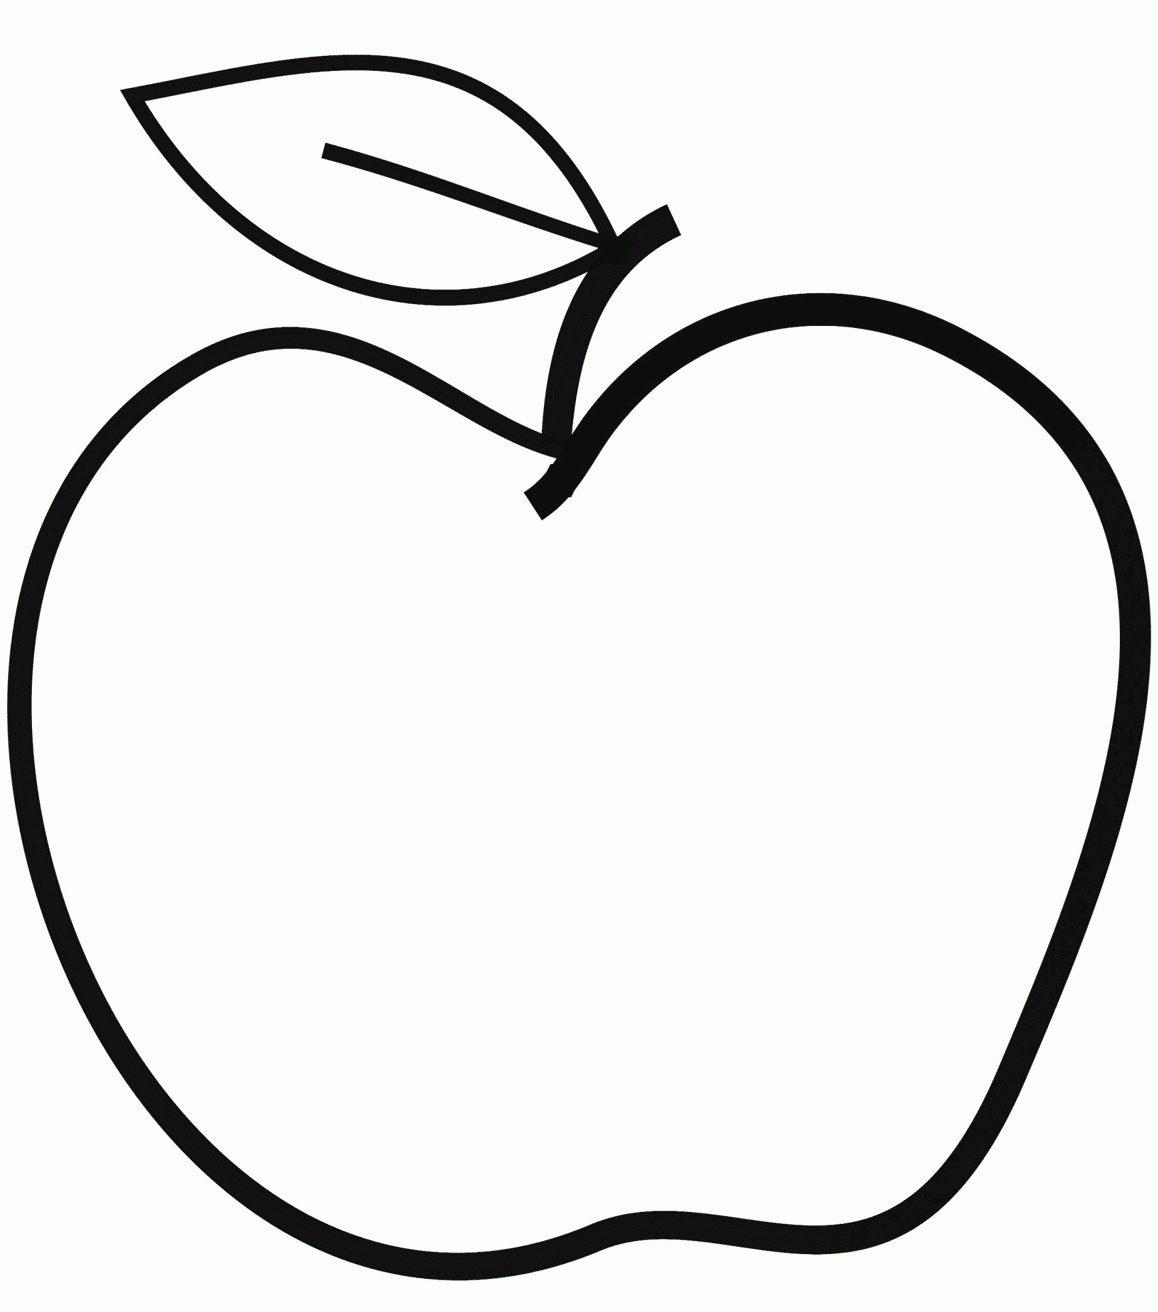 Ausmalbilder Apfel, Vordruck Apfel Schablonen Zum Ausdrucken für Schablonen Zum Ausdrucken Kostenlos